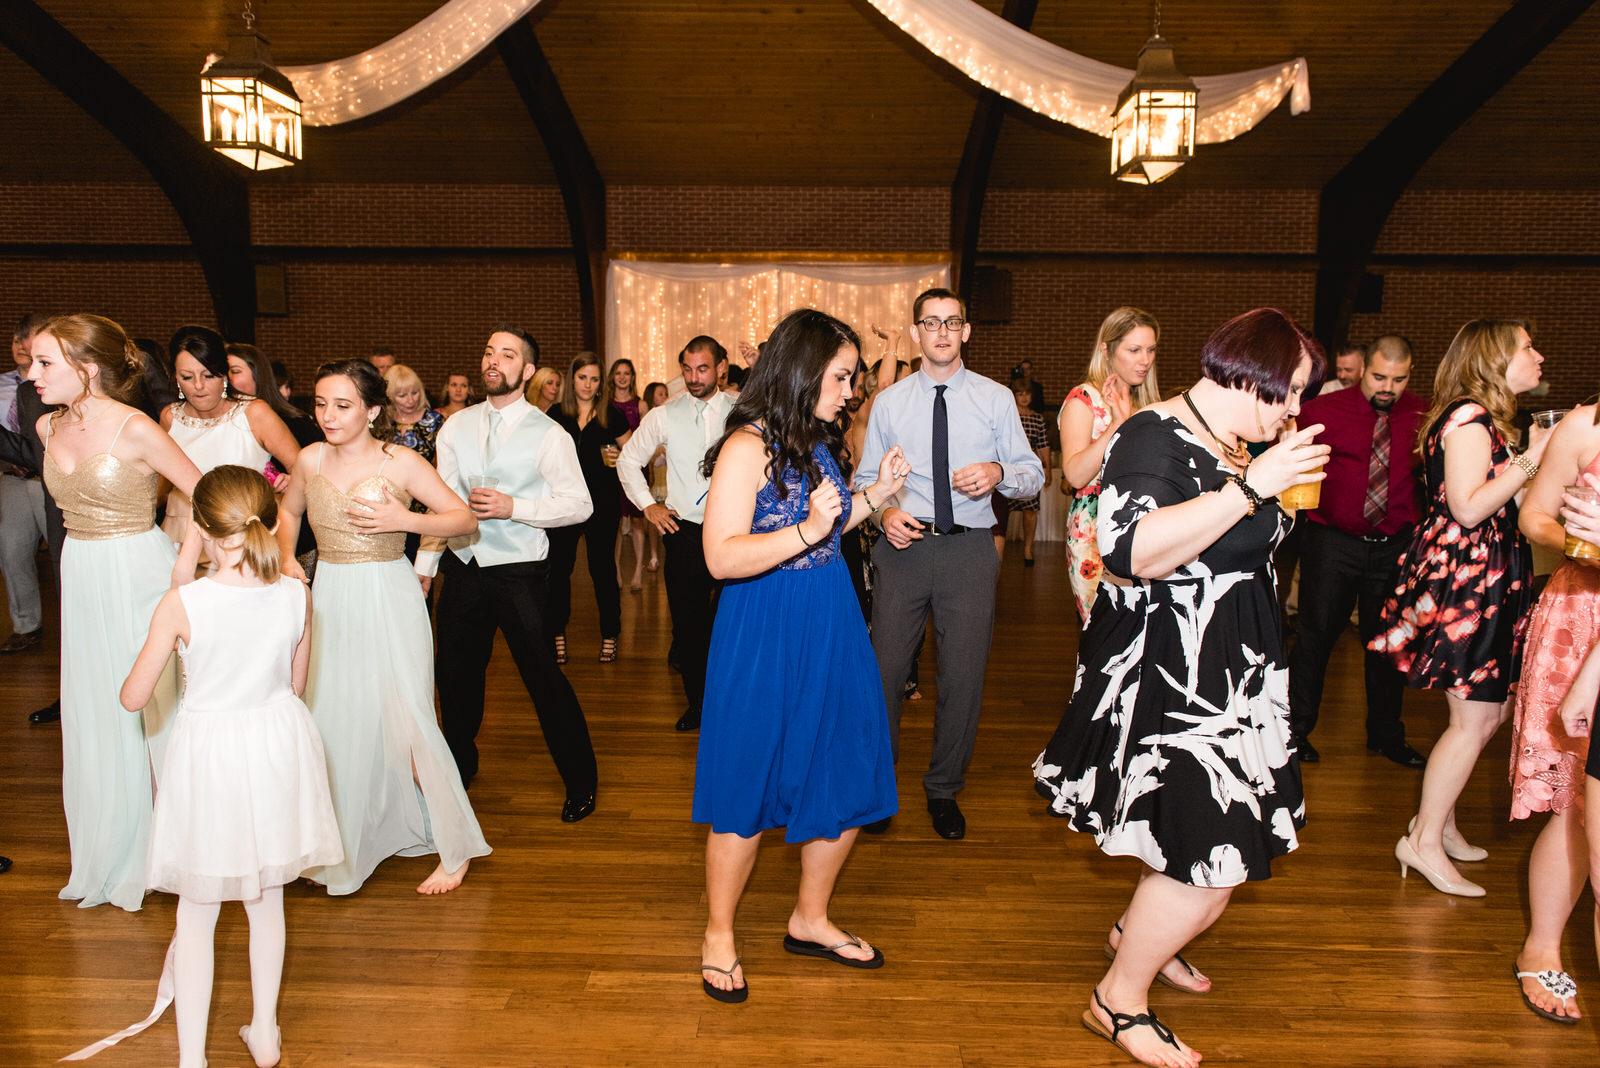 Laube_Banquet_Hall__Wedding_Photos_083.jpg